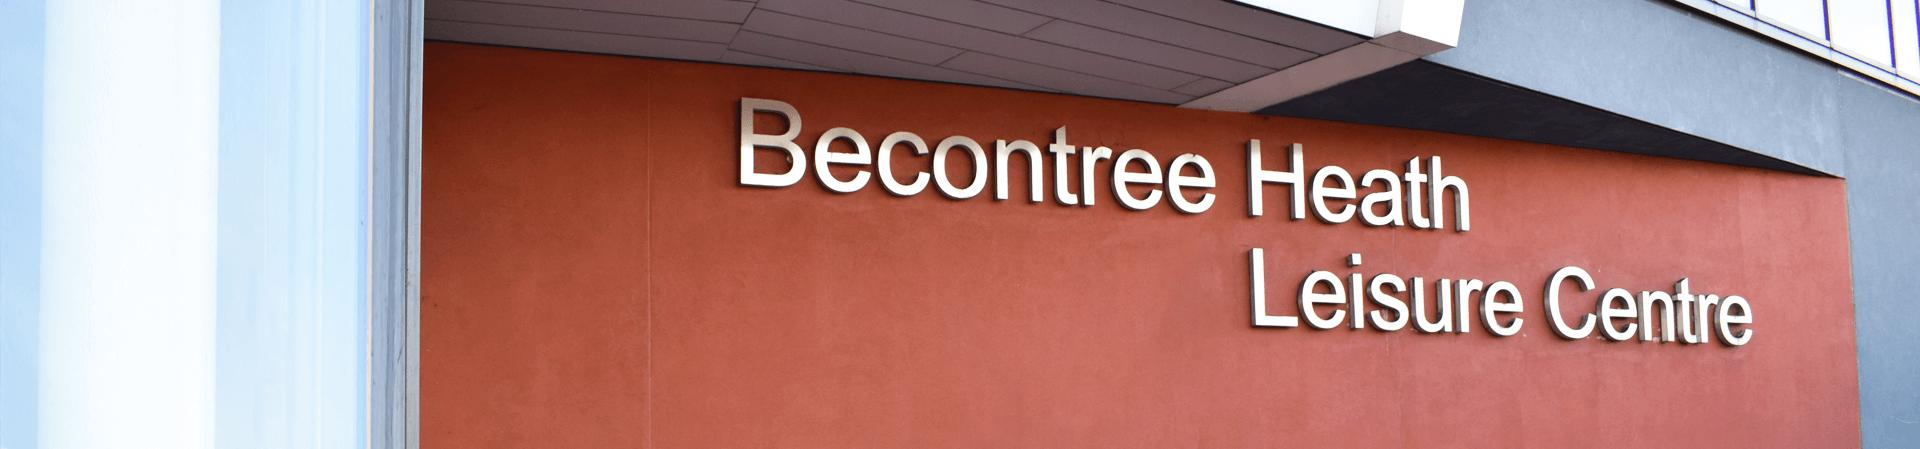 Becontree Heath Leisure Centre | Gym Swim & Soft Play